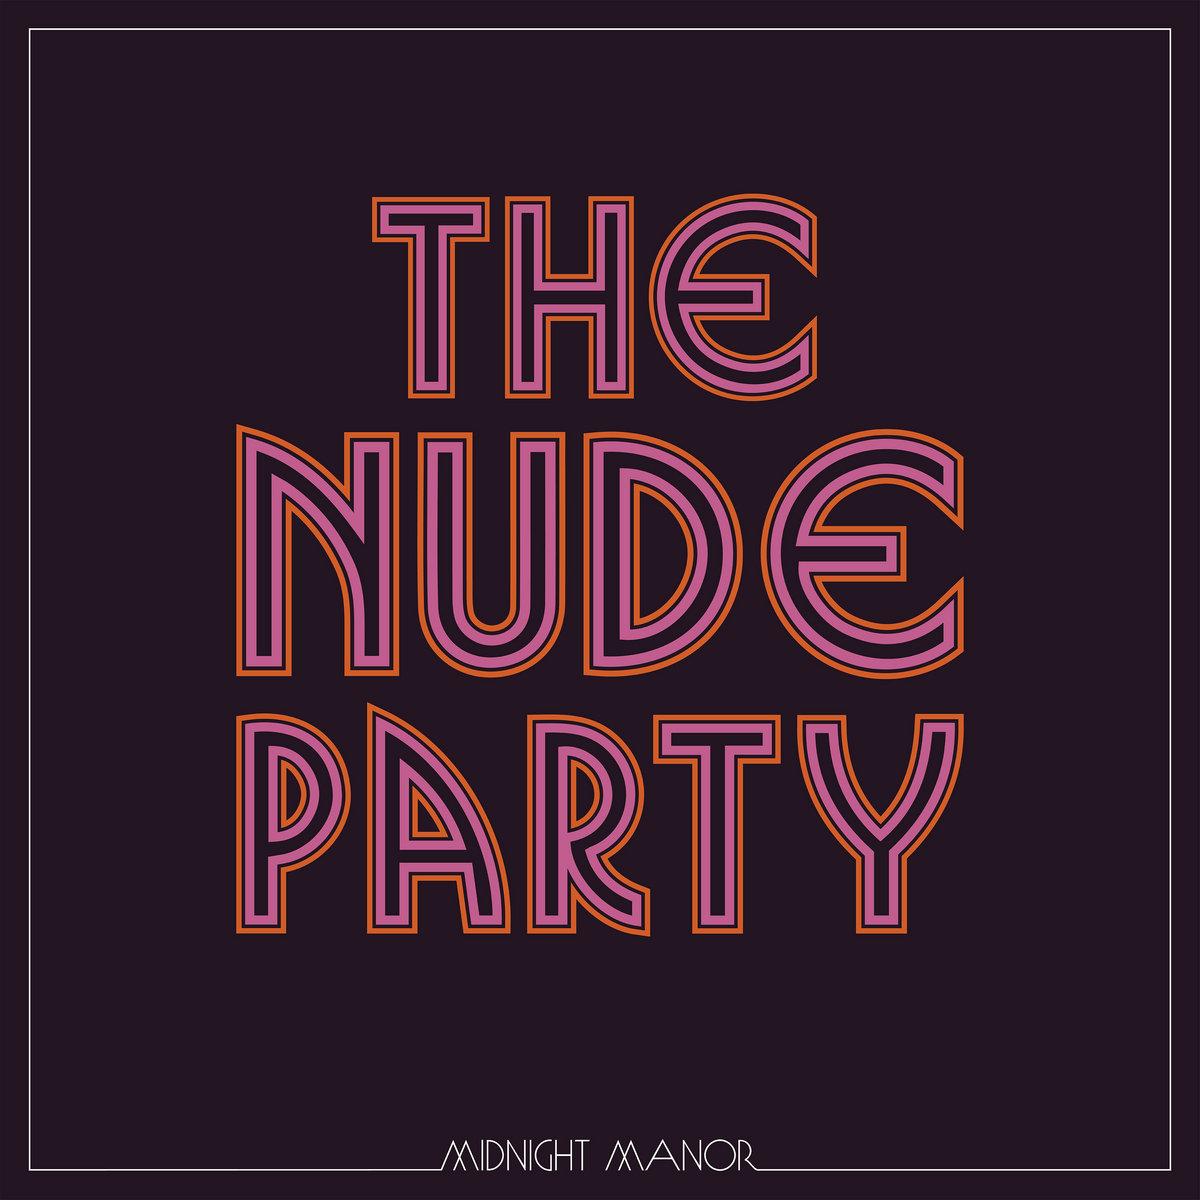 Party naturist Nuptial nudity: